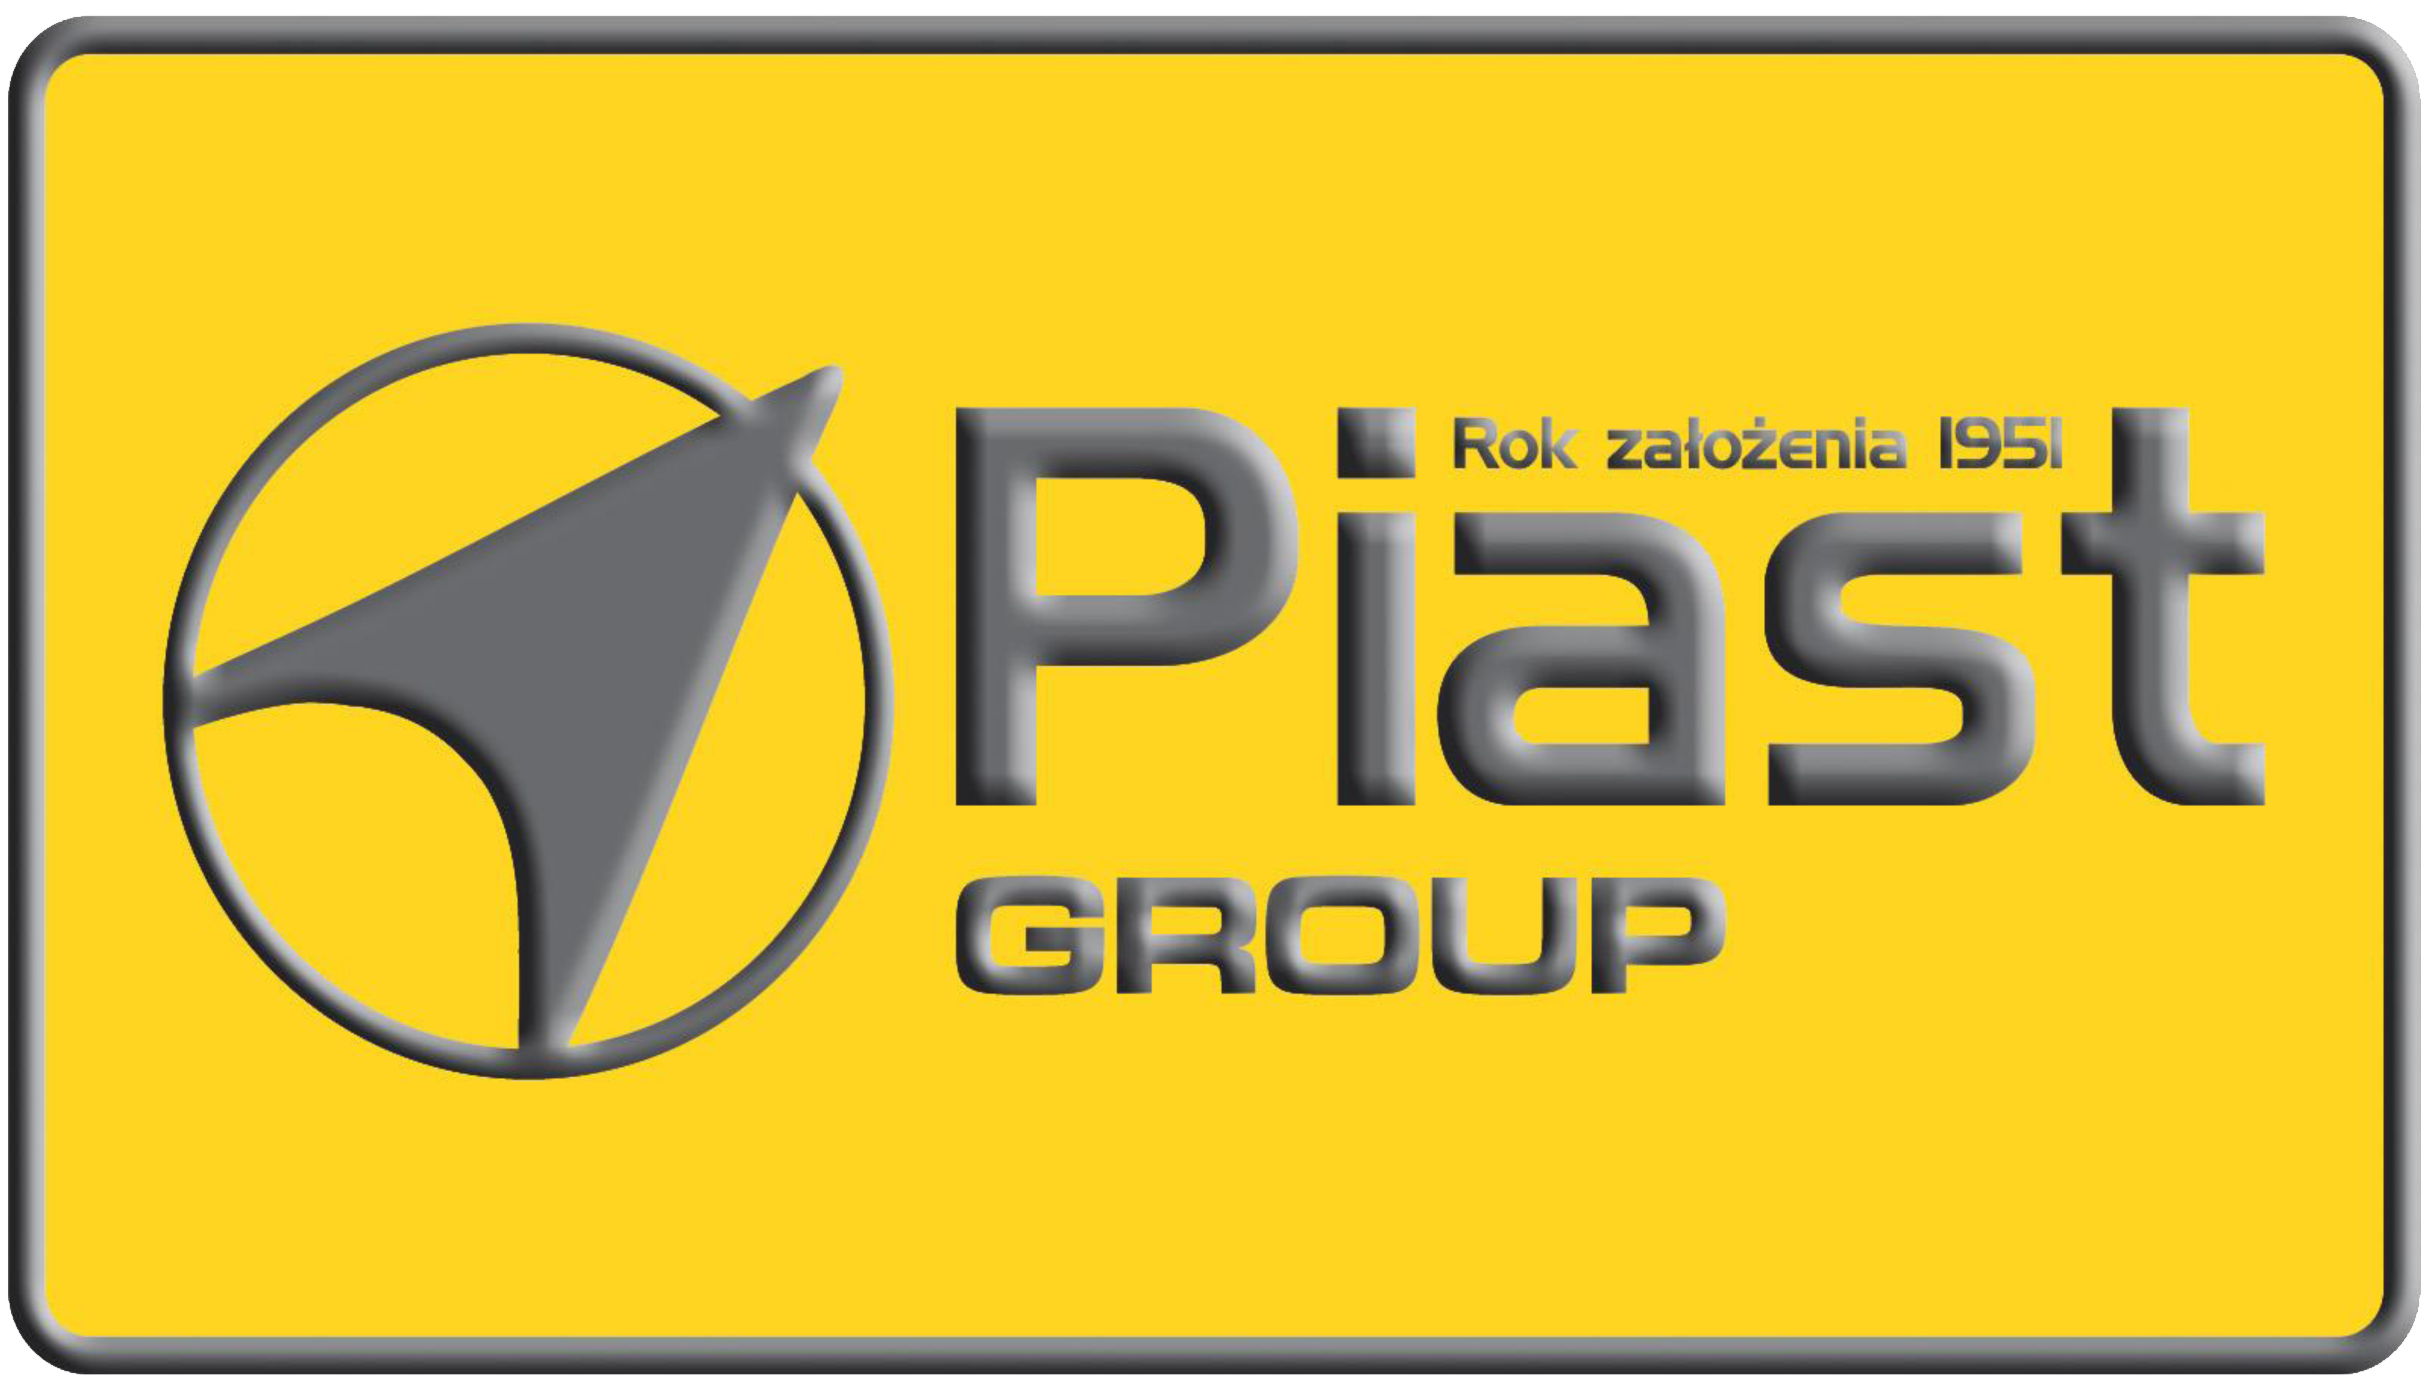 http://www.piast.info.pl/